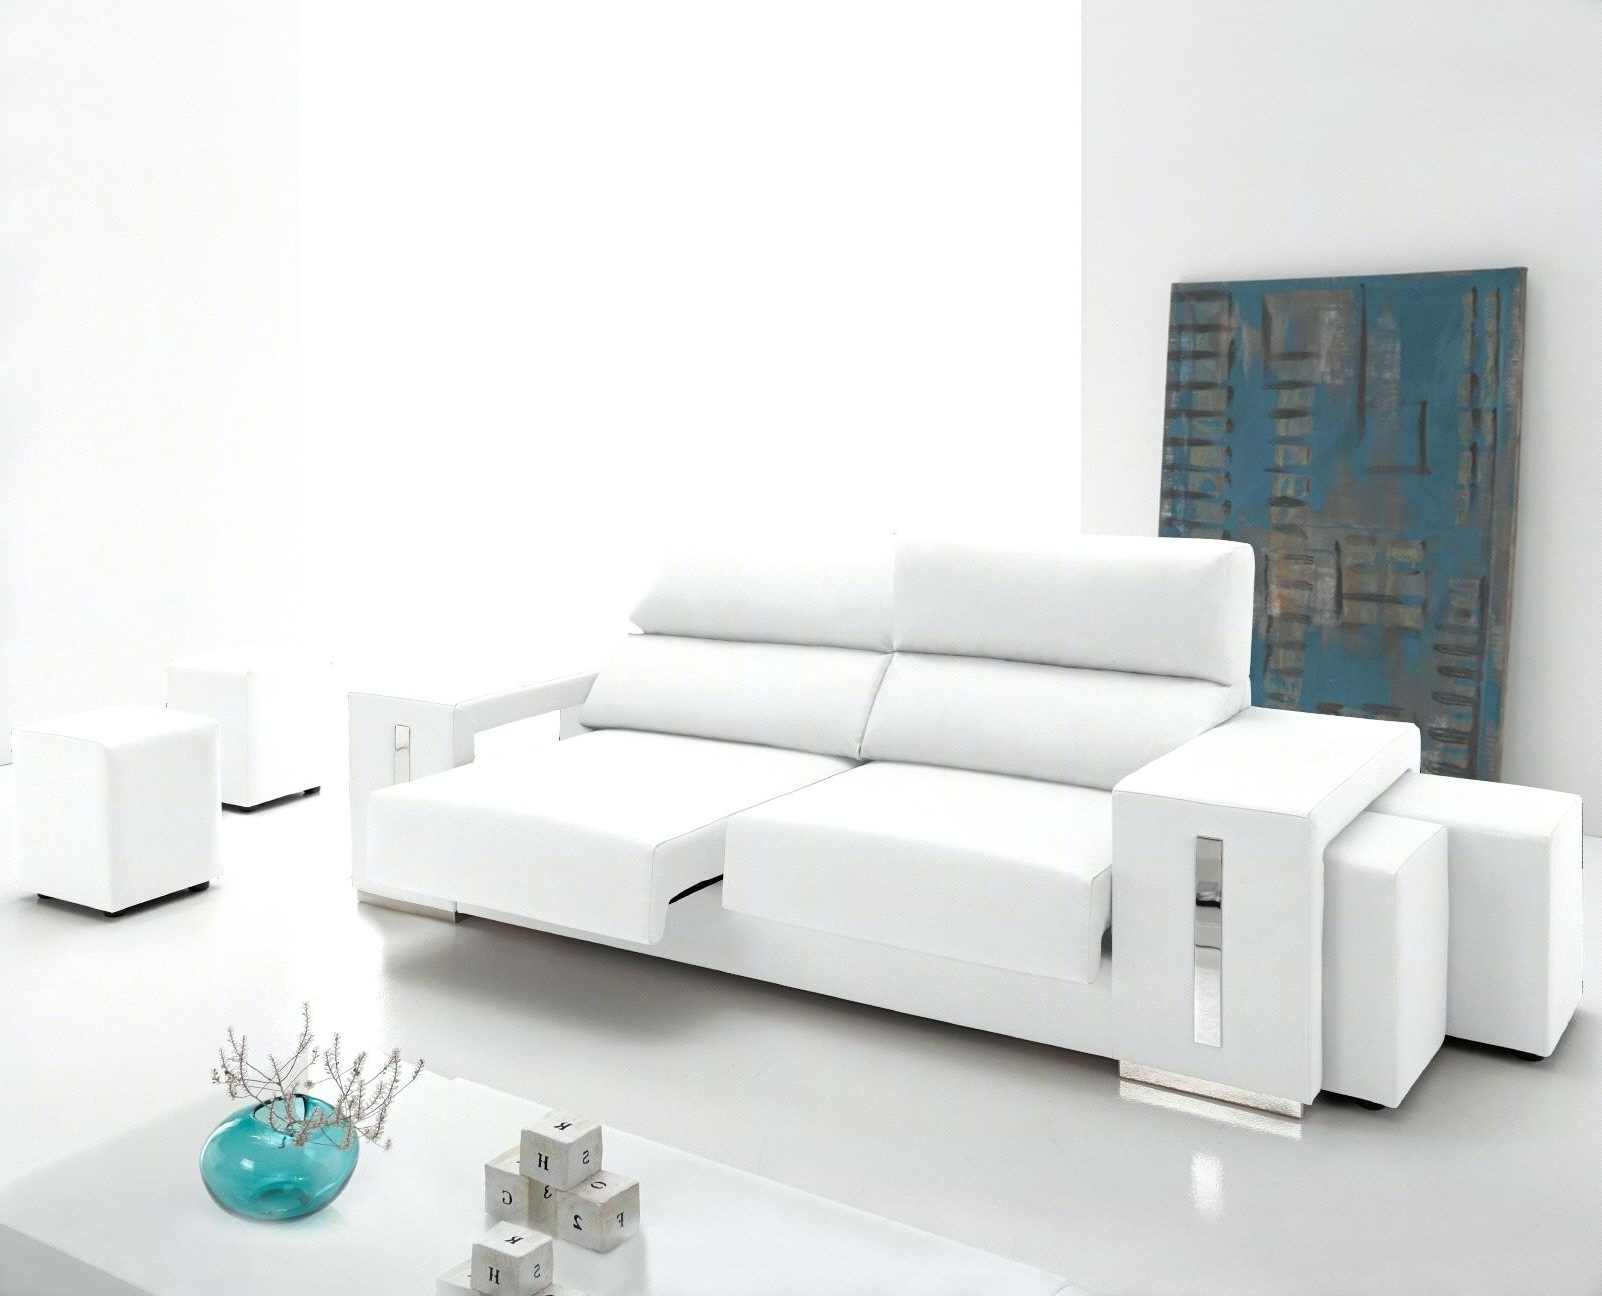 Sillon Levantapersonas Conforama Gdd0 sofas Relax Zoom De sofa Cooper De Losbu Fabricantes sofas Relax